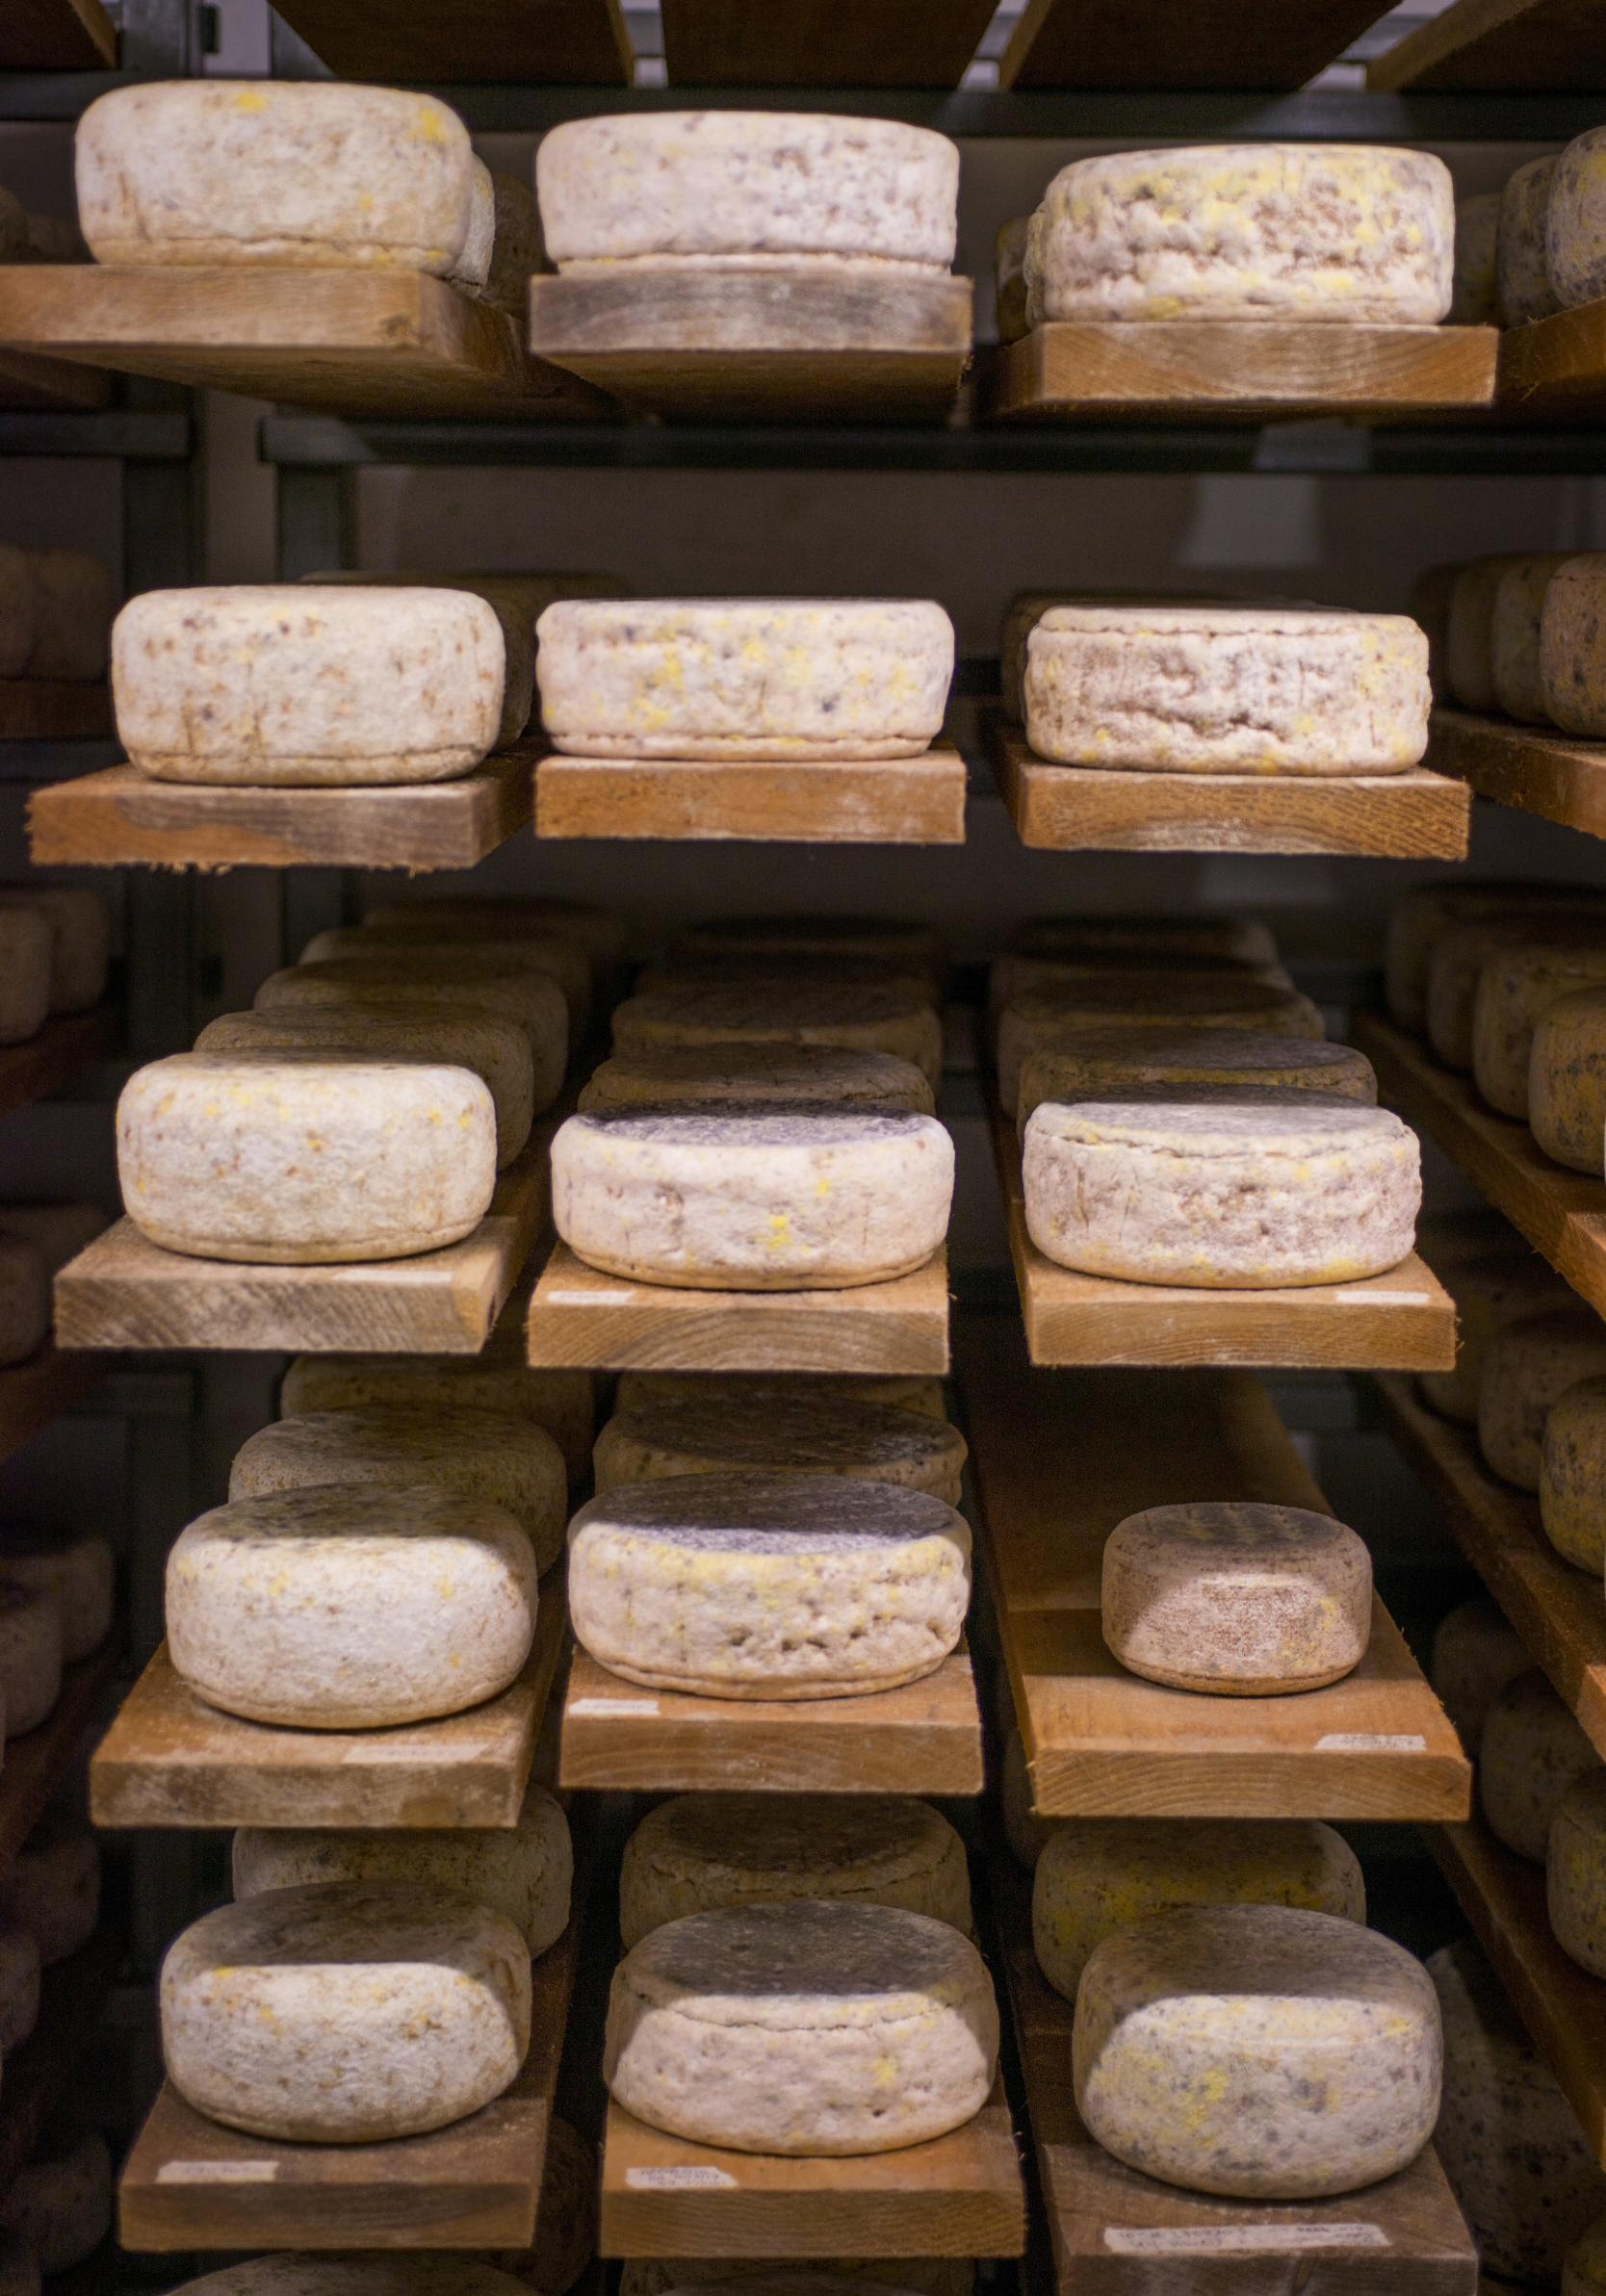 cheese_cave_TOM5235.jpg